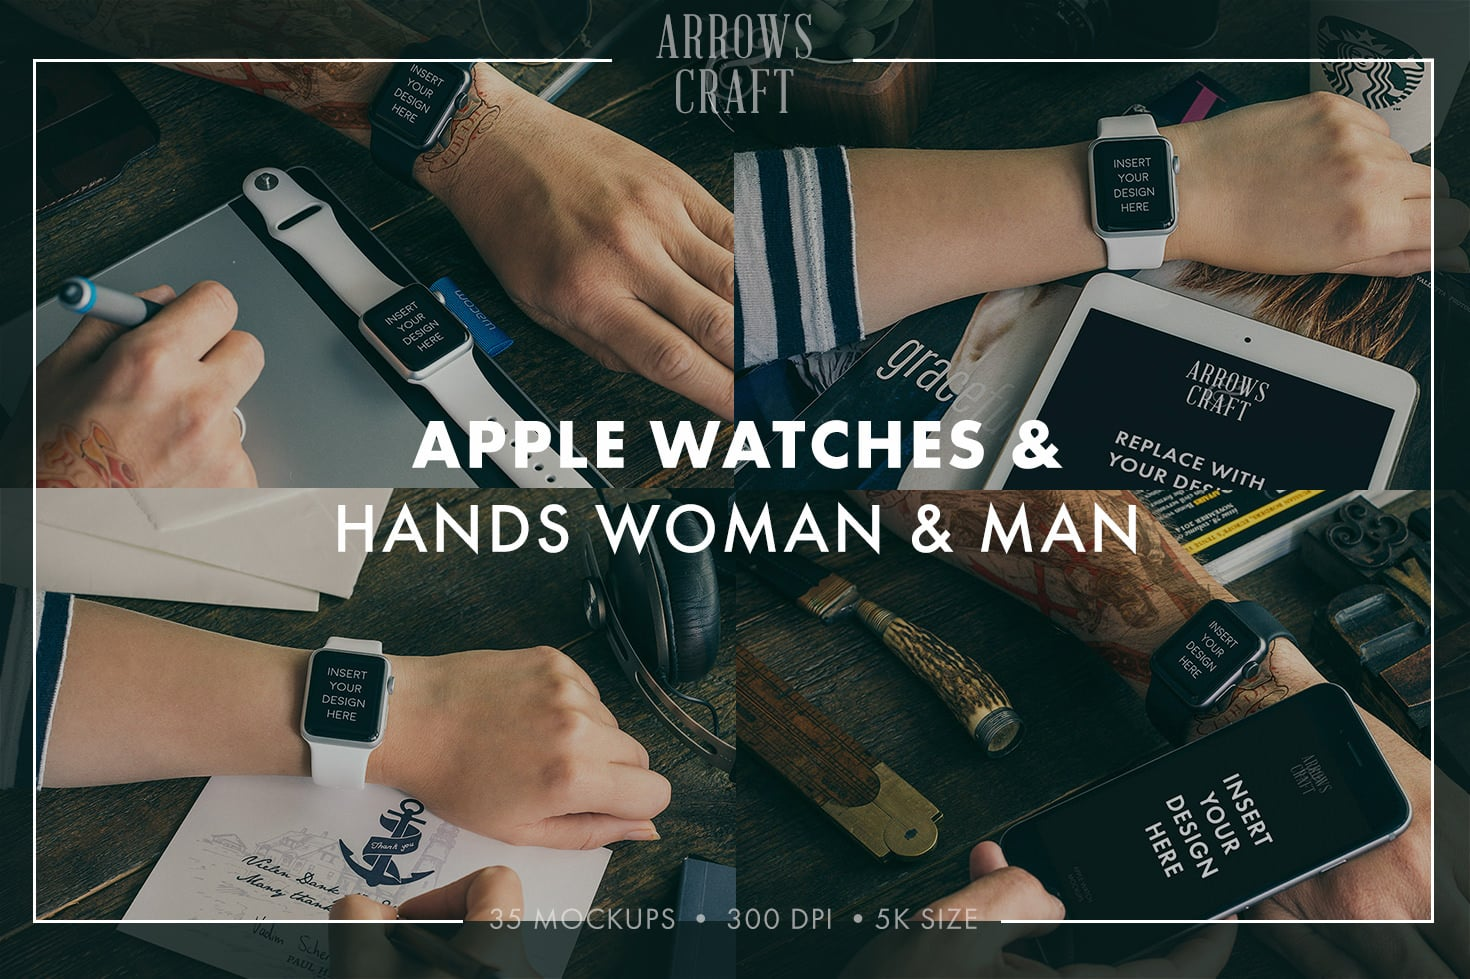 35 Amazing Hip & Stylish Apple Watch Mockups PSD 2020 - Arrows Craft page04